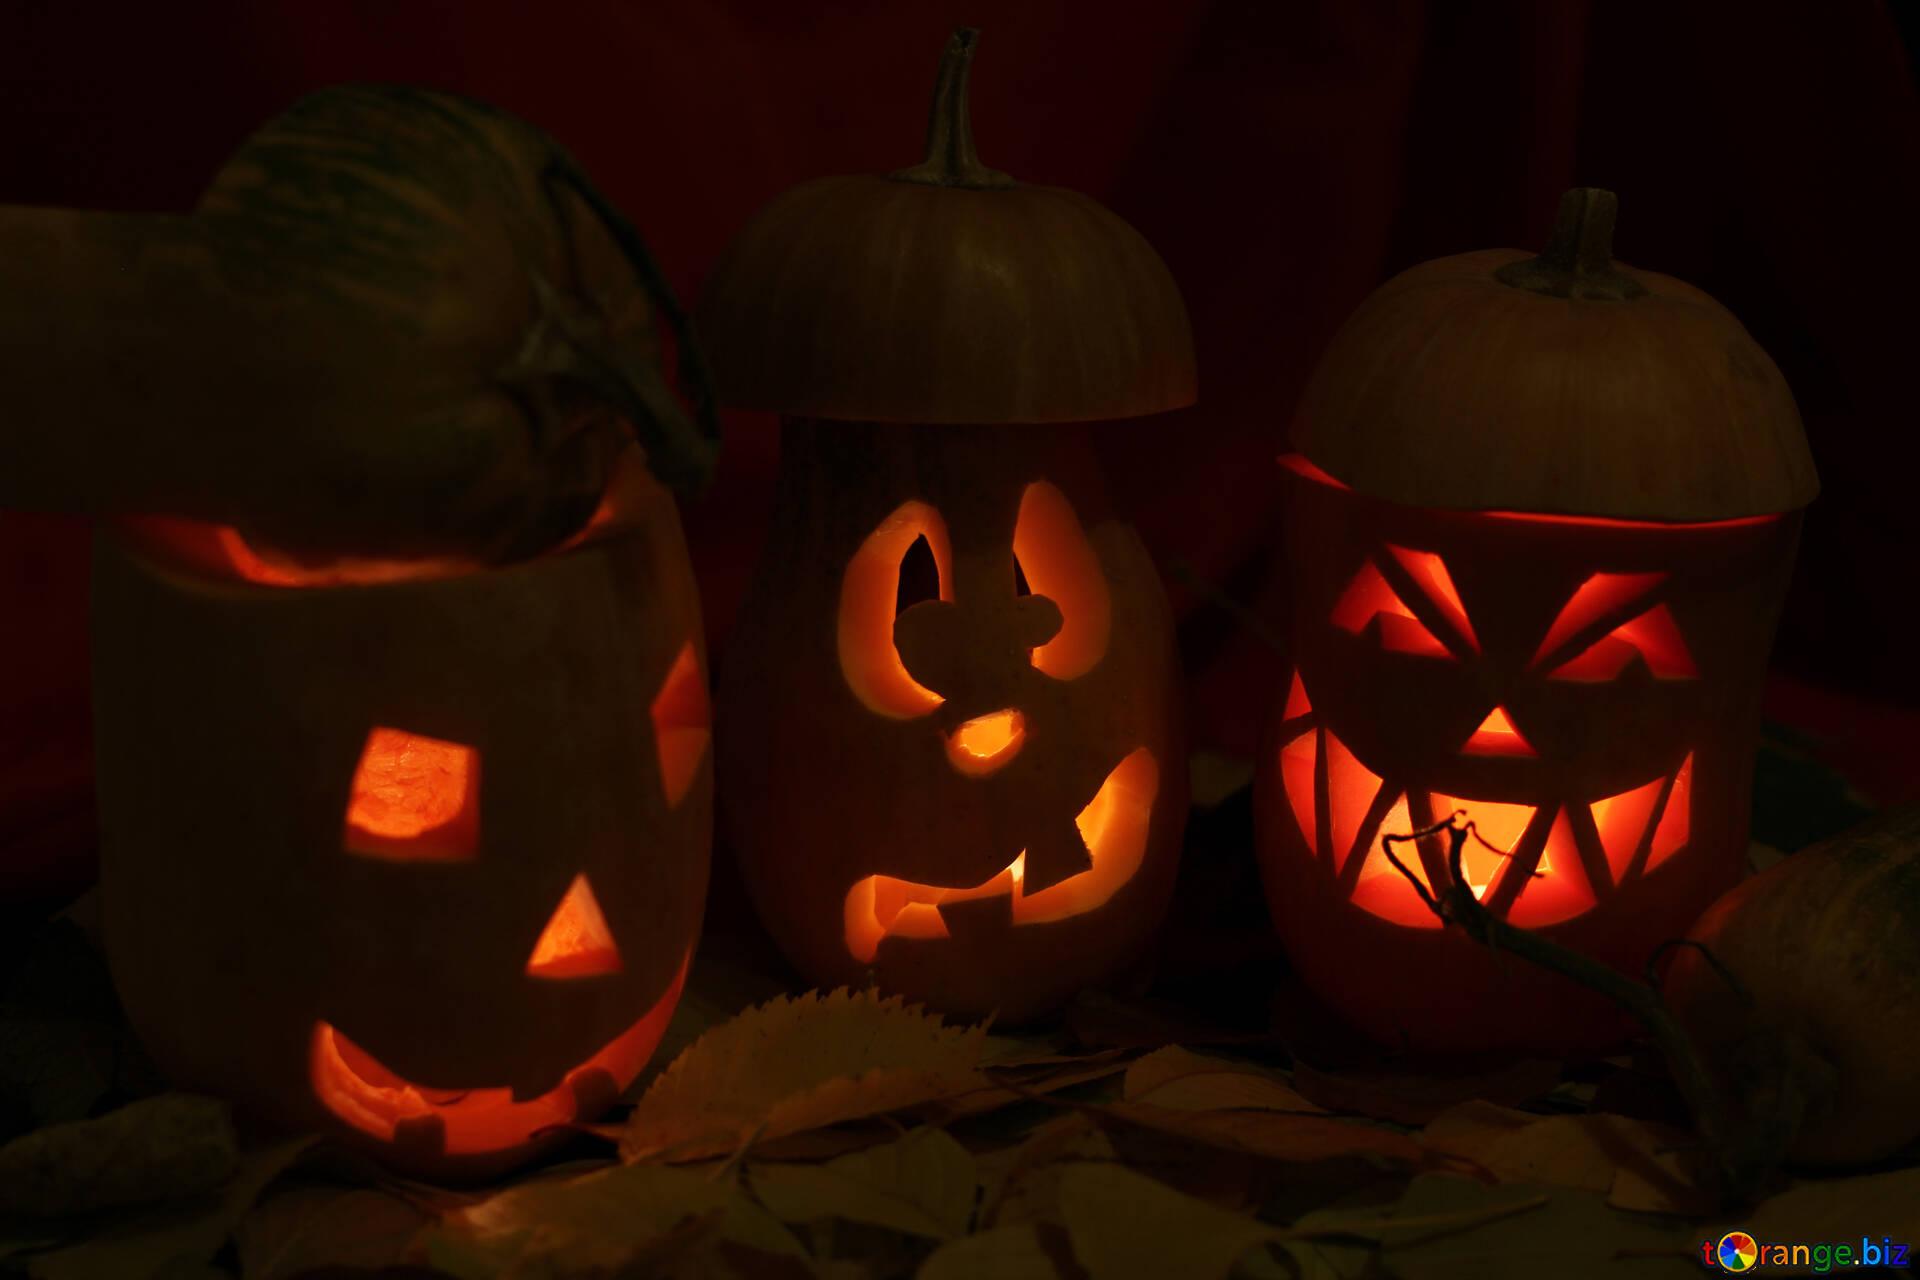 Fixtures Of Pumpkins For Halloween Greeting Card For Halloween